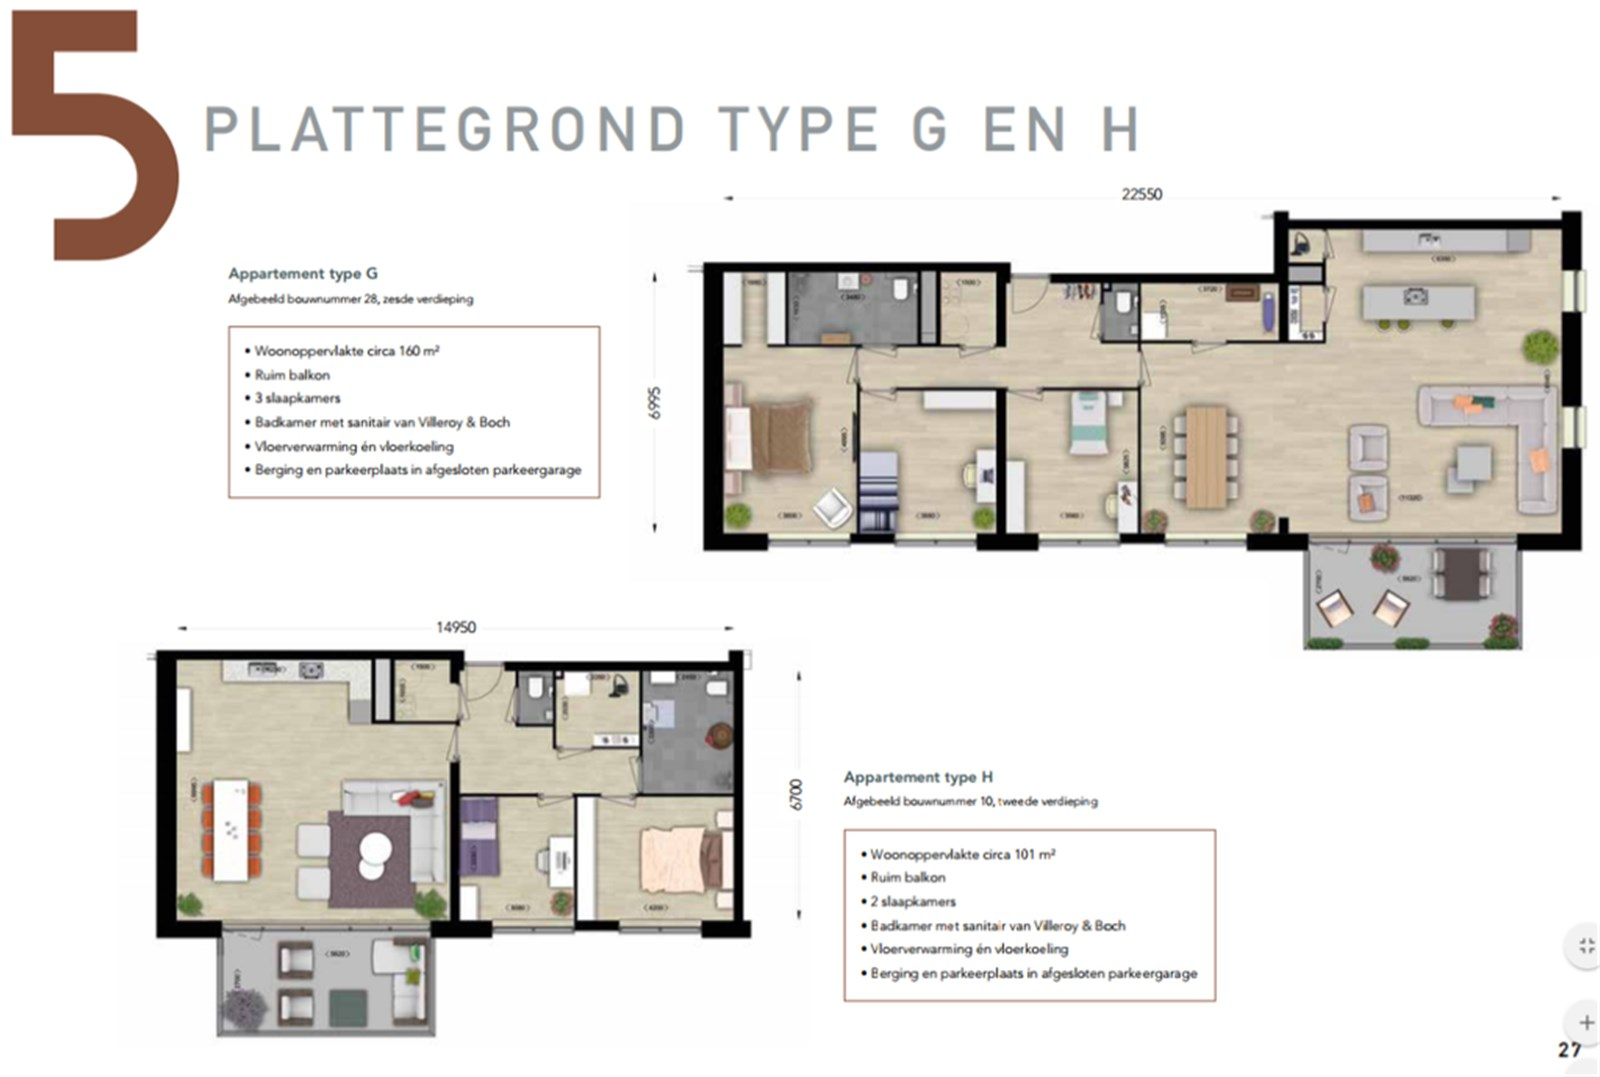 https://media.mva.nl/MVASysteem/WONEN/NBLNP294110/Plattegrond-type-G-en-H.jpg